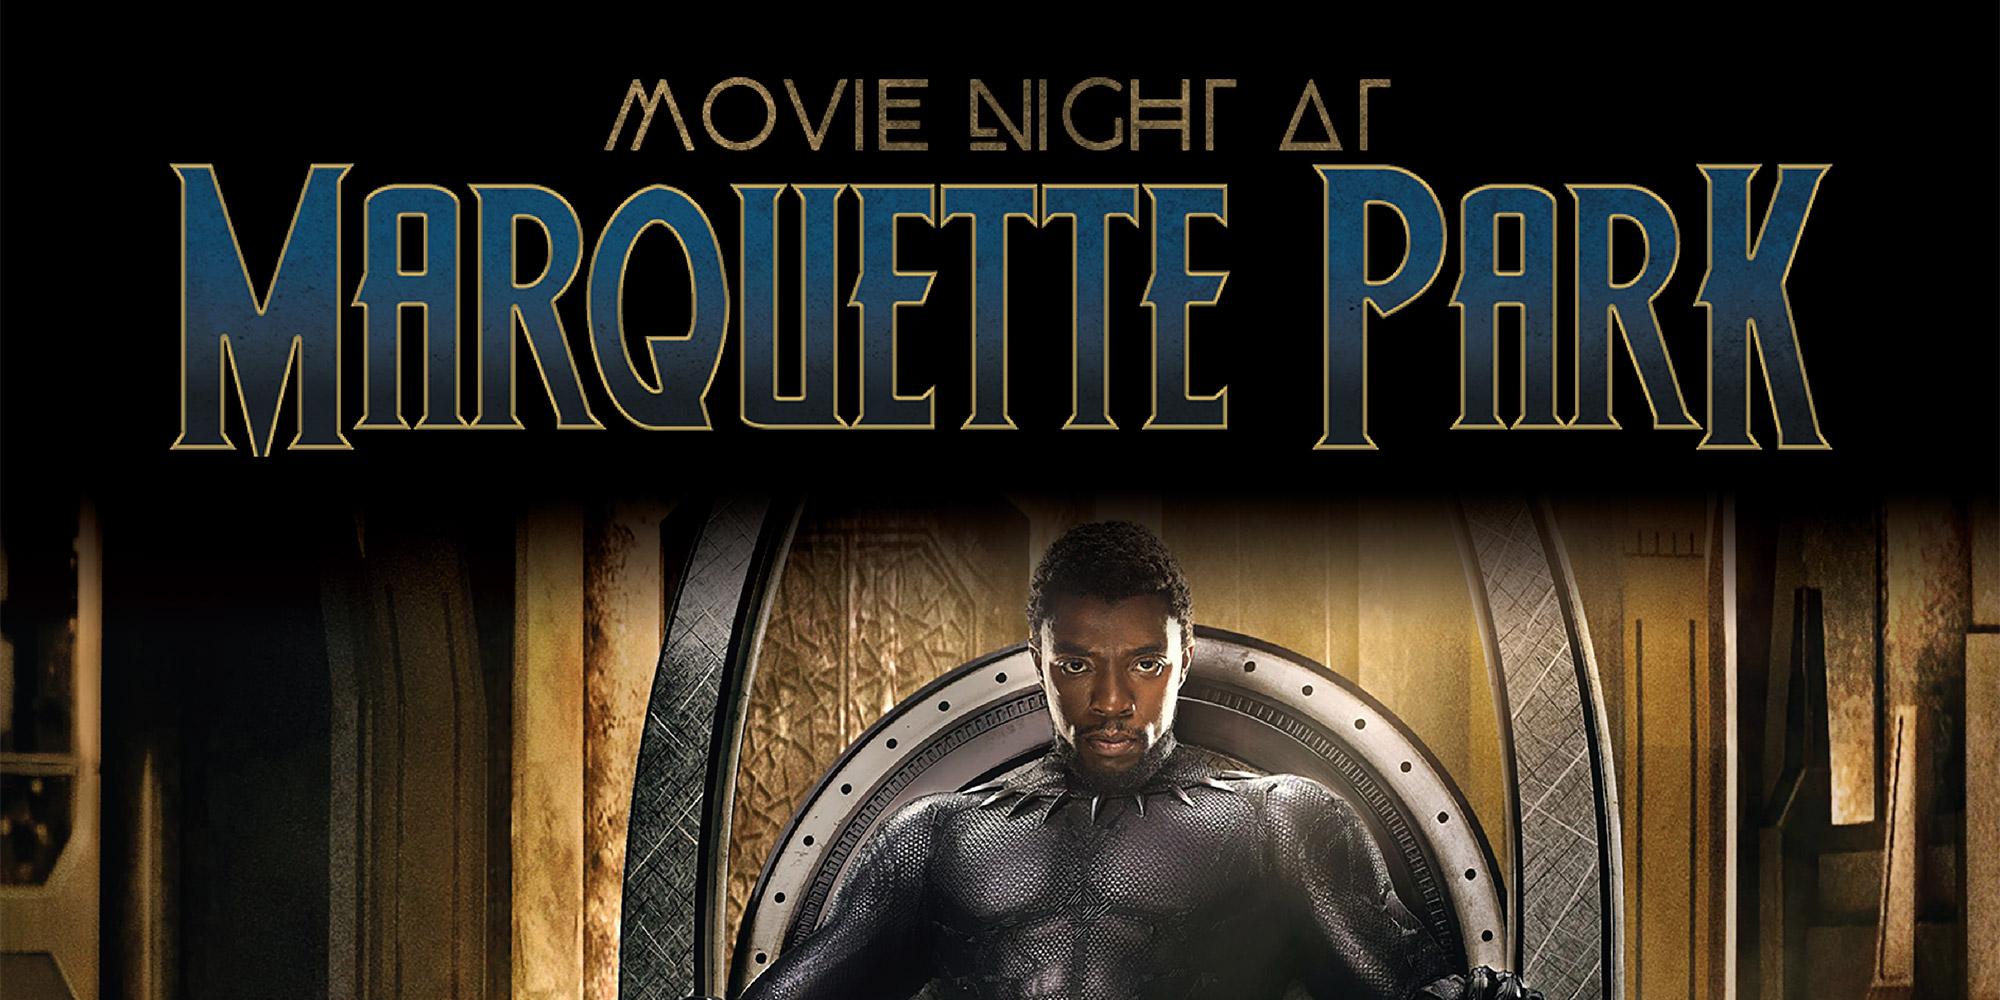 Black Panther movie poster.